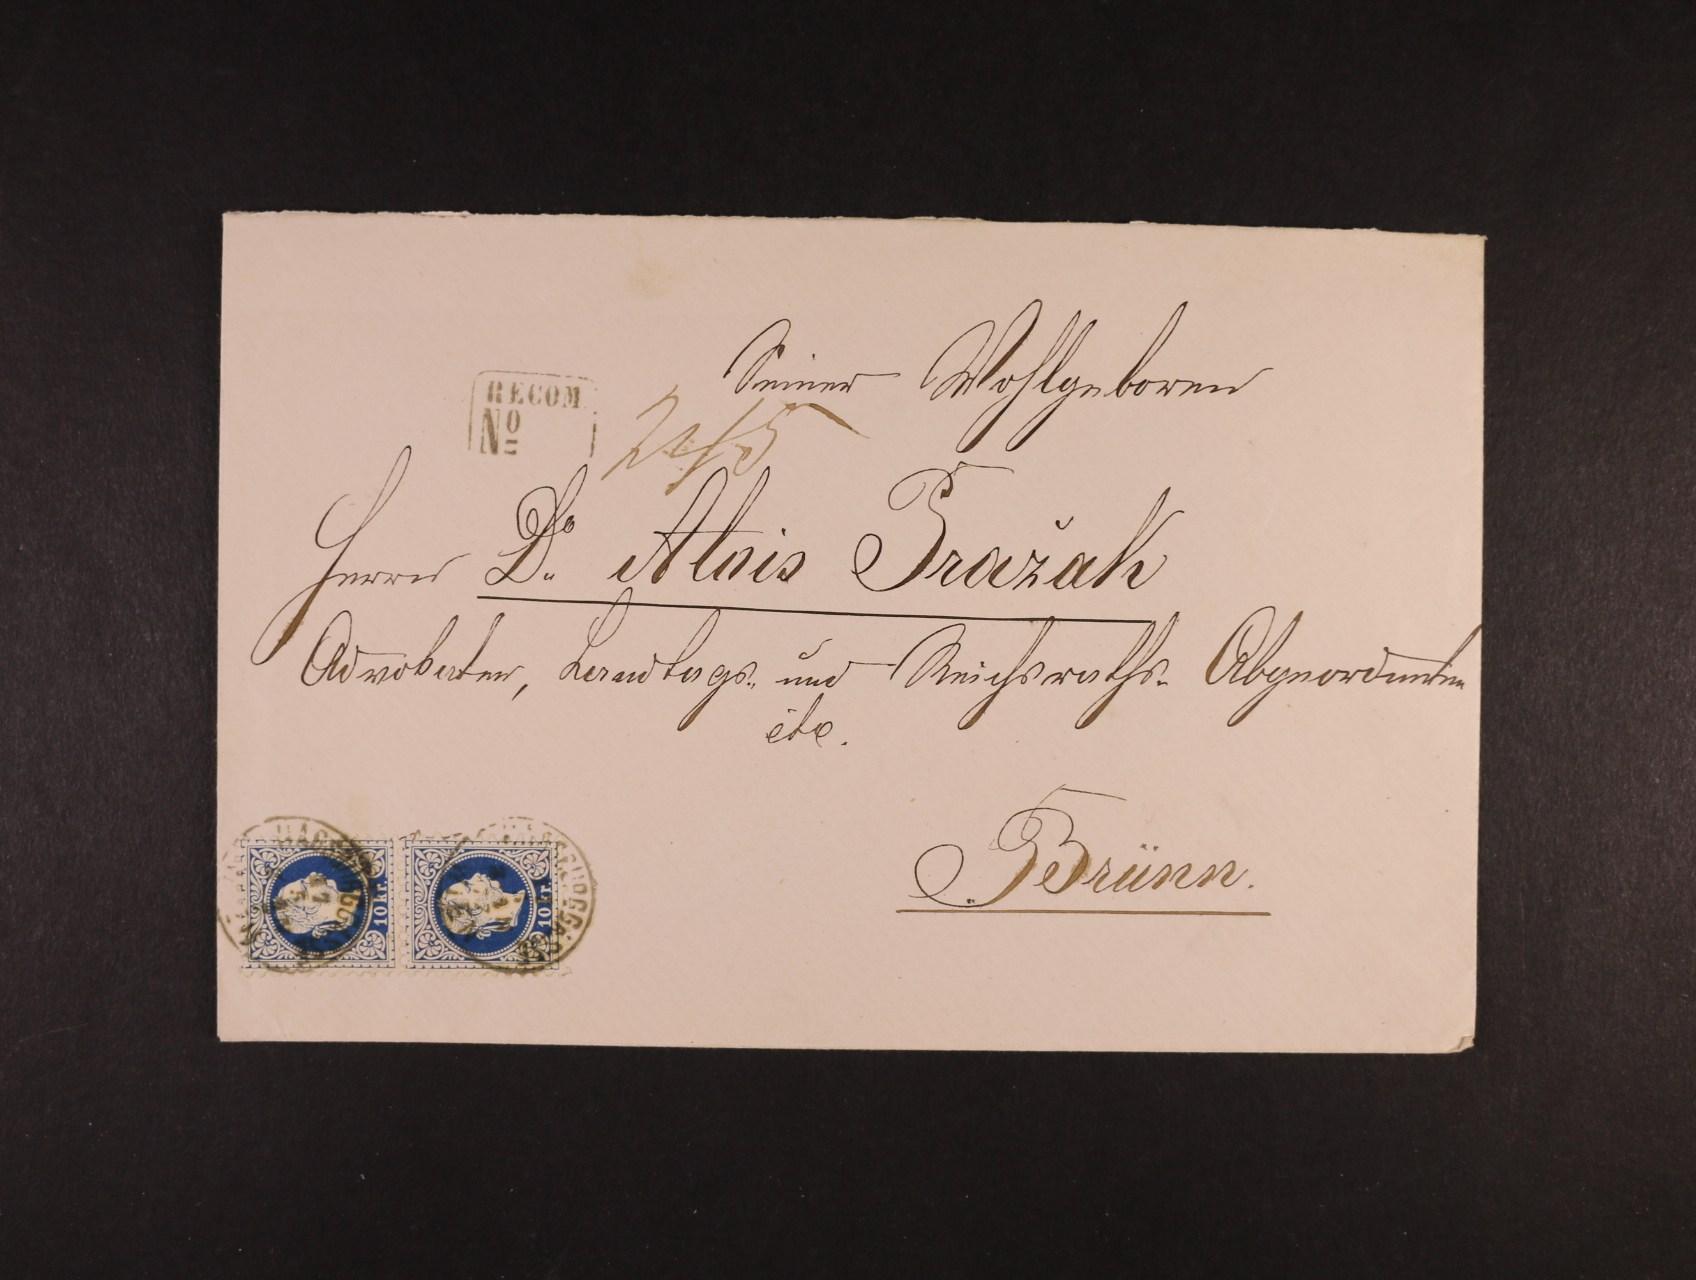 R-dopis do Brna z r. 1877 frank. svislou dvoupáskou zn. Fe. č. 38 II, pod. raz. WIEN HABSBURGGASSE 17.5., přích. raz., lux. kvalita